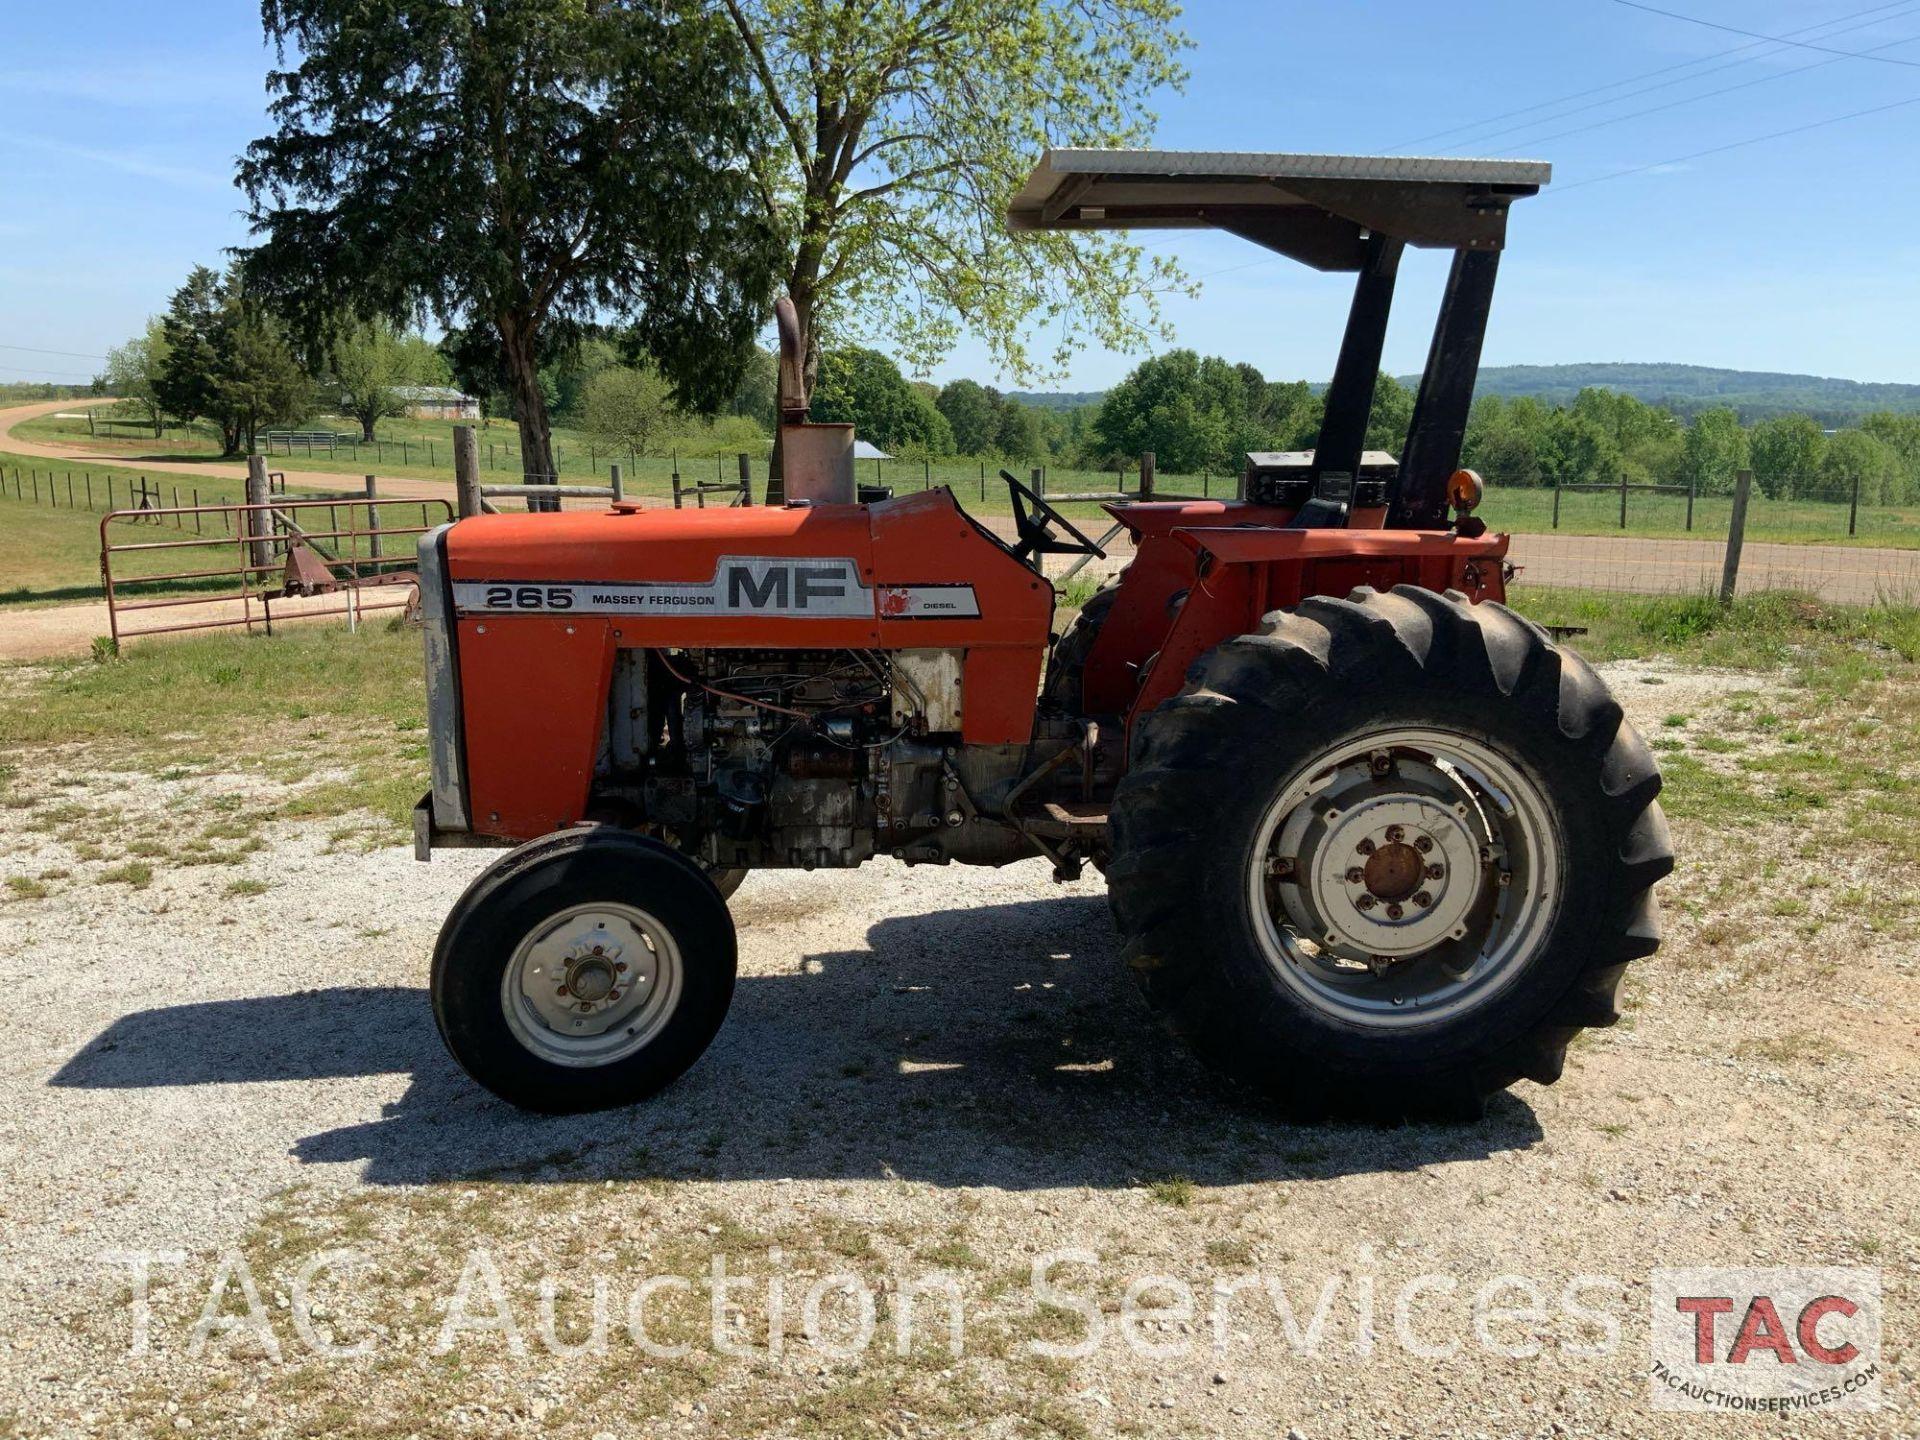 Massey Ferguson 265 FarmTractor - Image 2 of 23